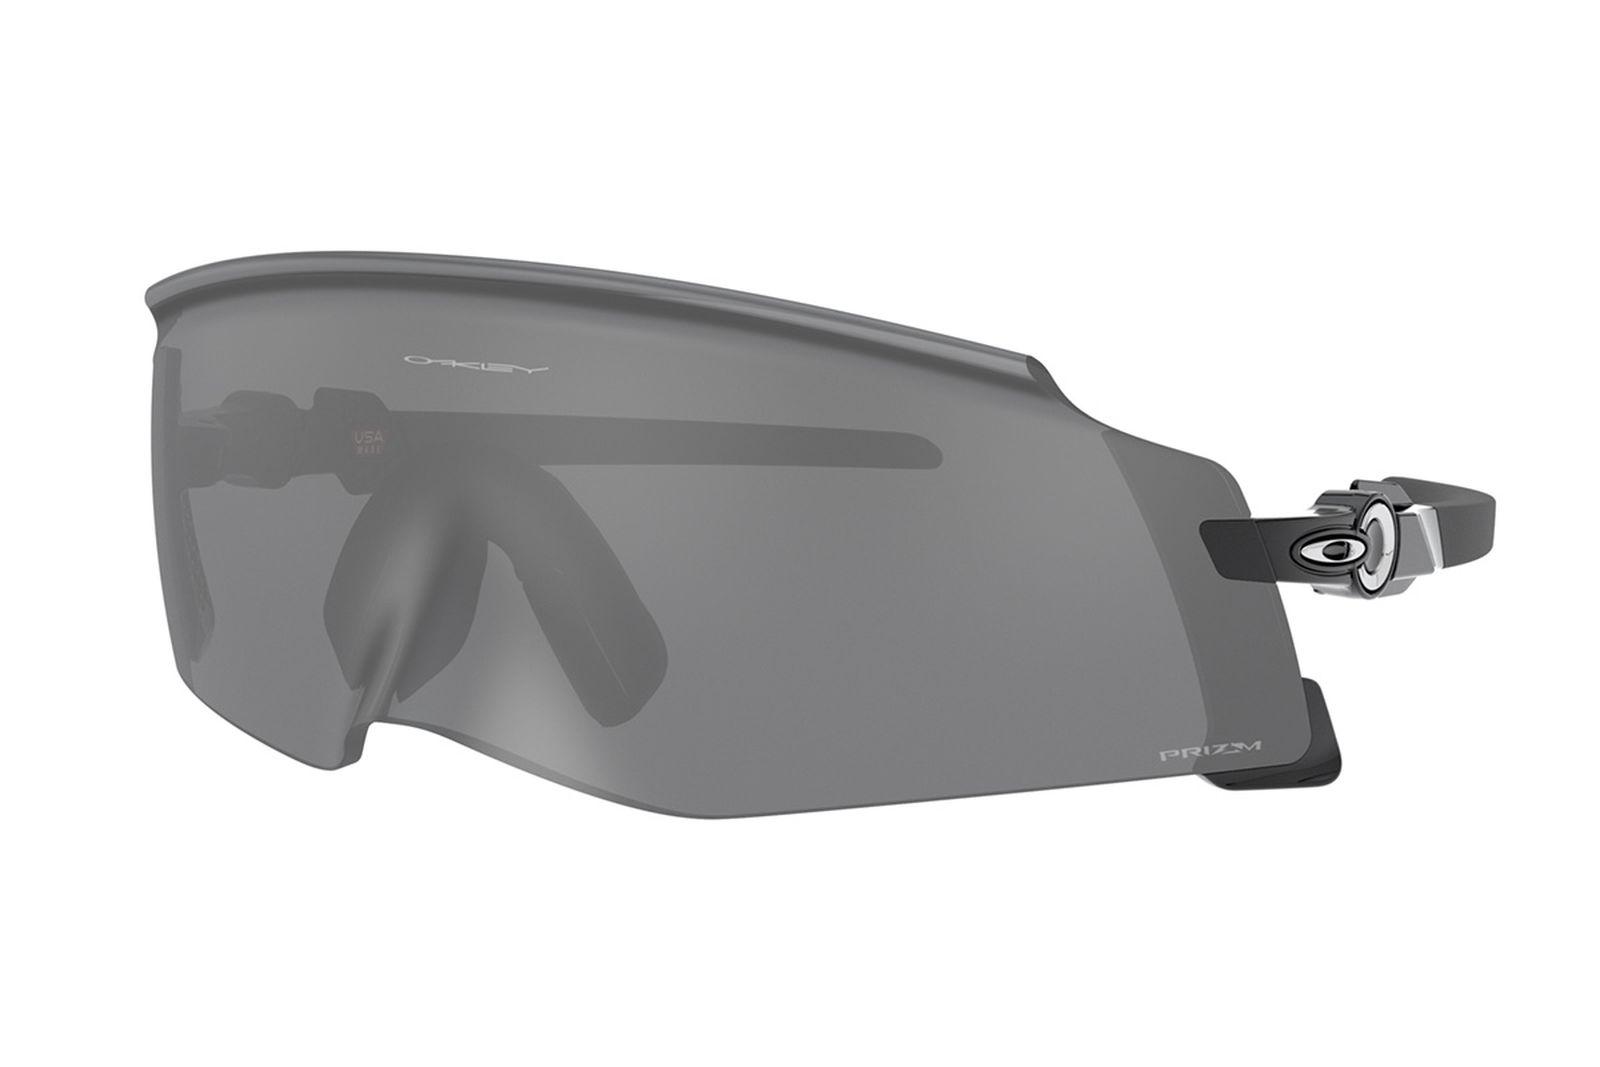 oakley-kato-sunglasses-03